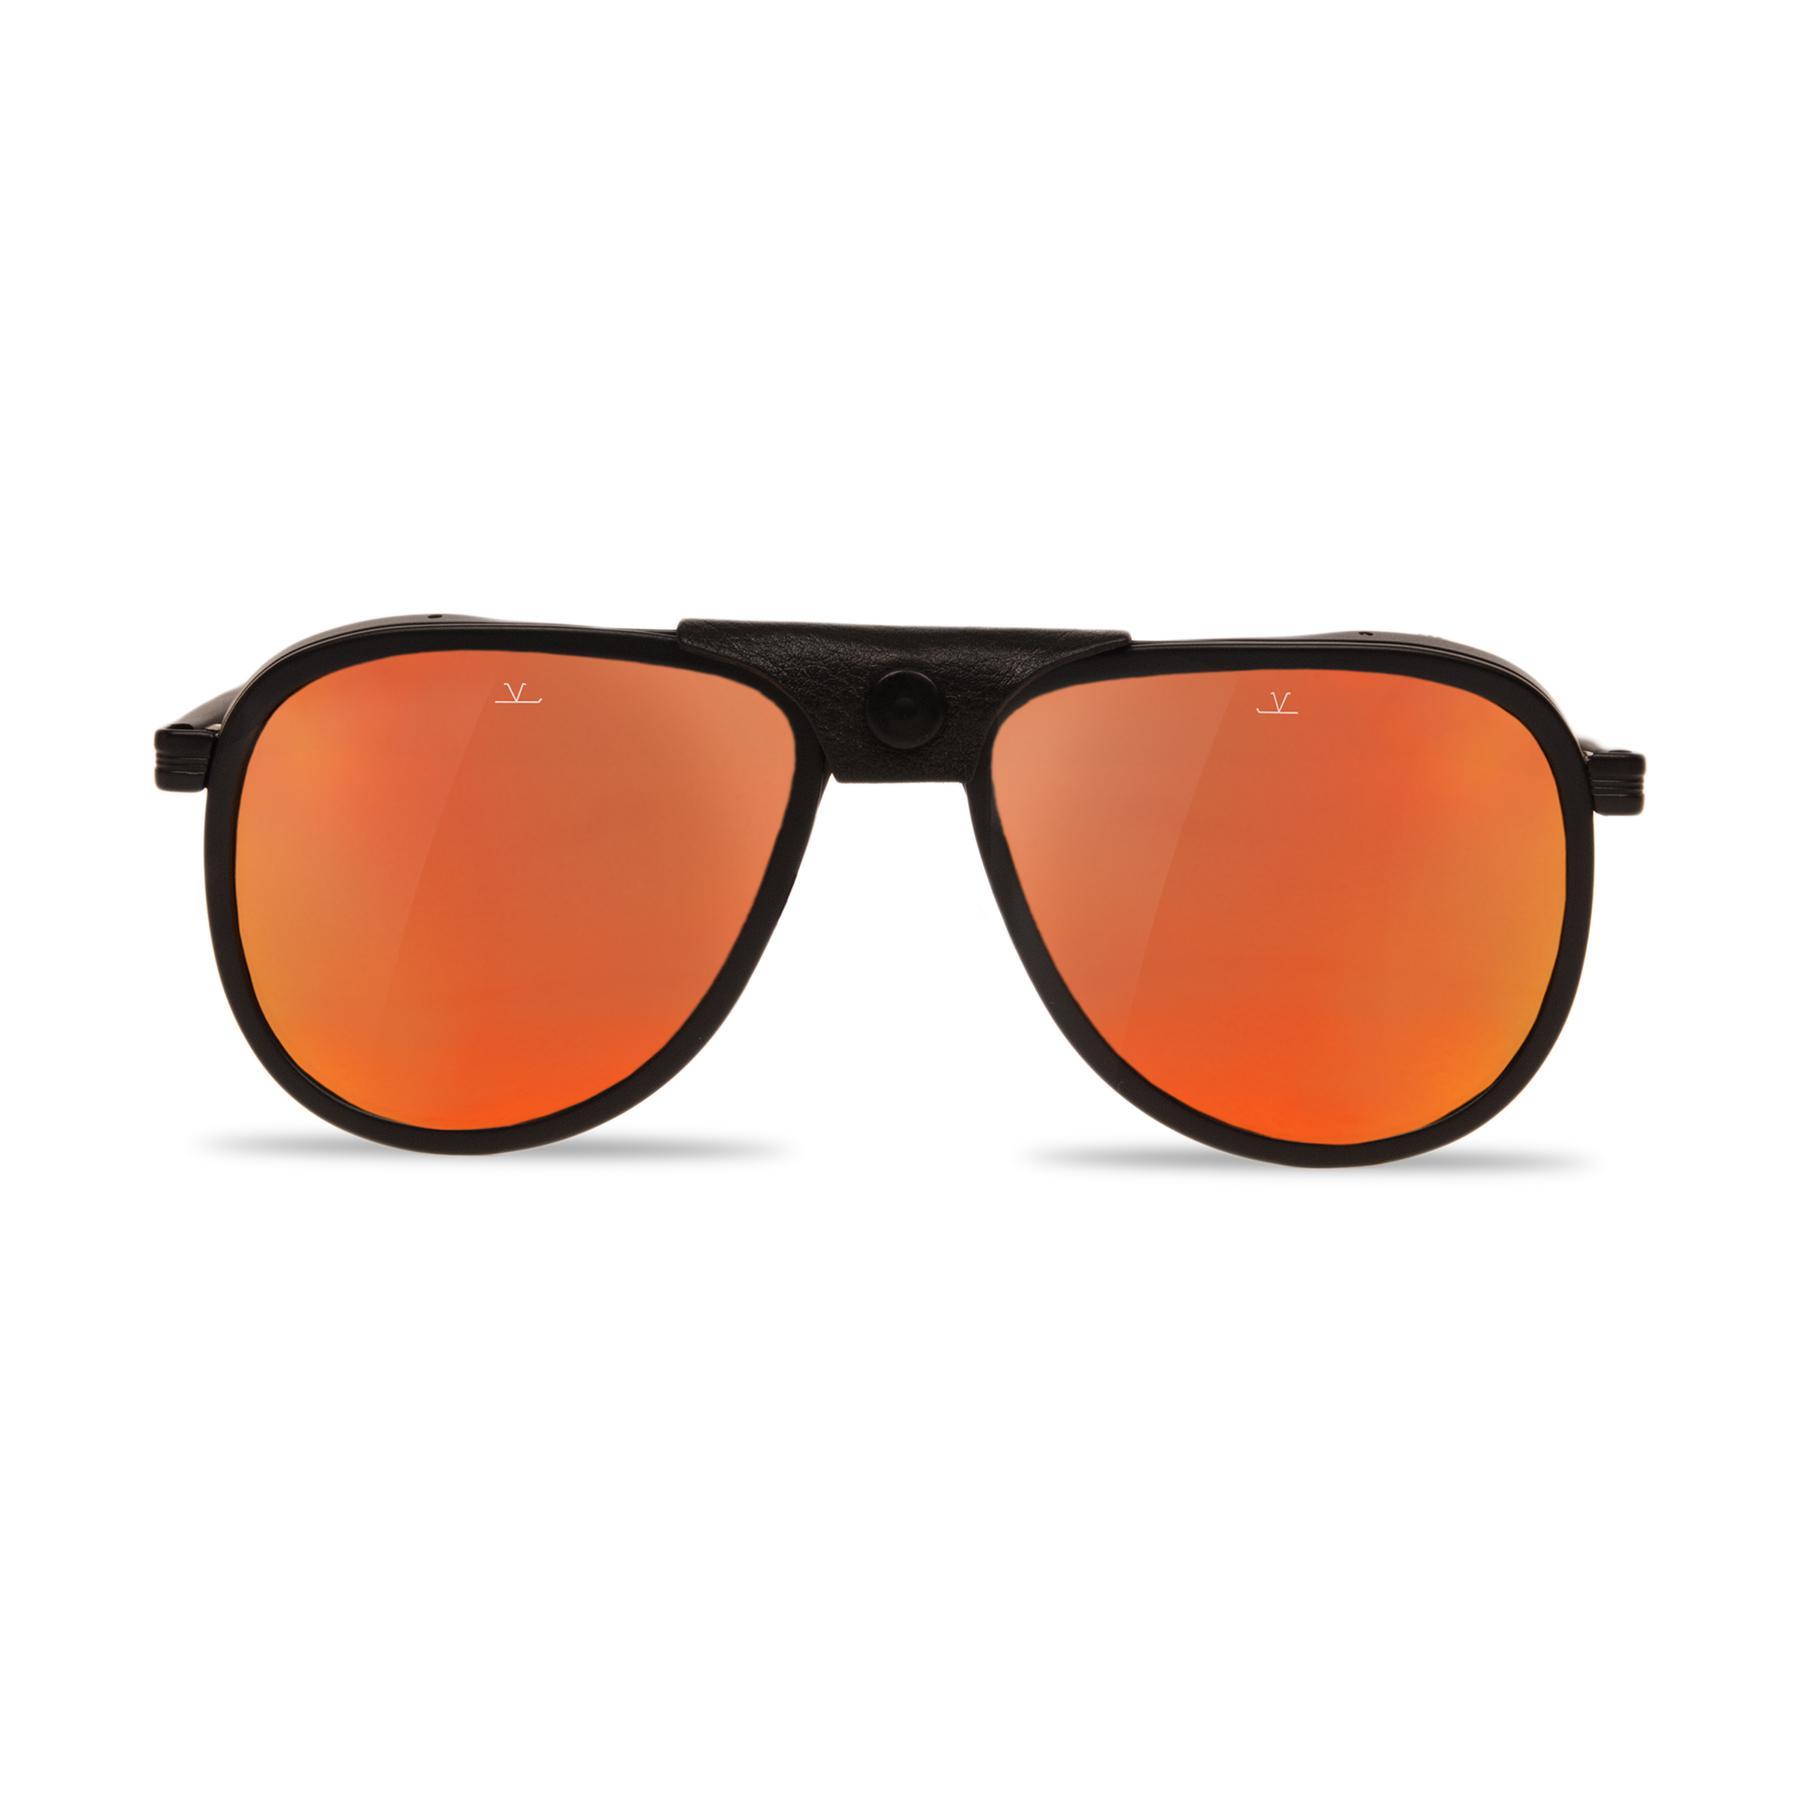 Sunglasses Aviator GLACIER1957 steel acetate black matte red Vuarnet umMjWo5VUP